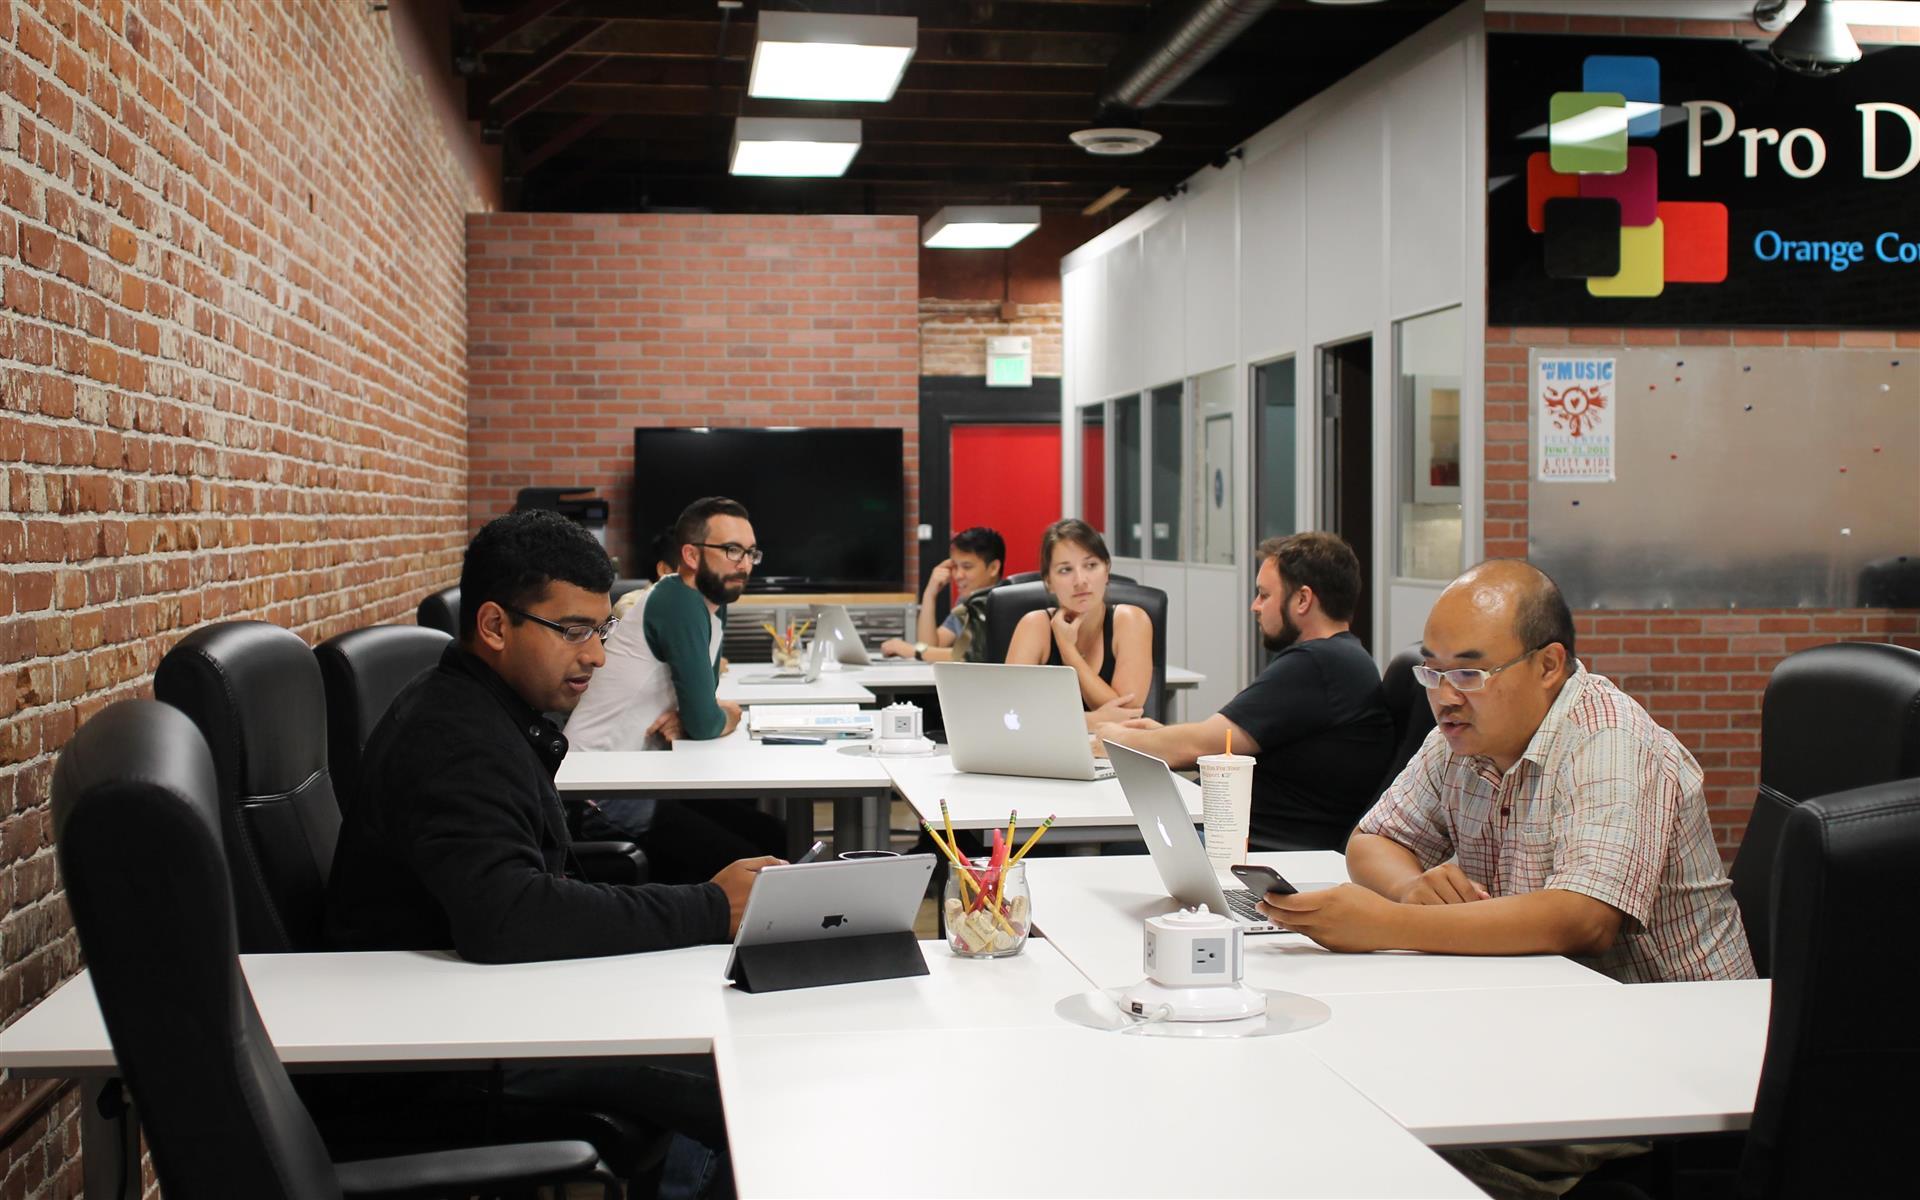 Pro Desk Space - Open Desk - 8 Day Pass